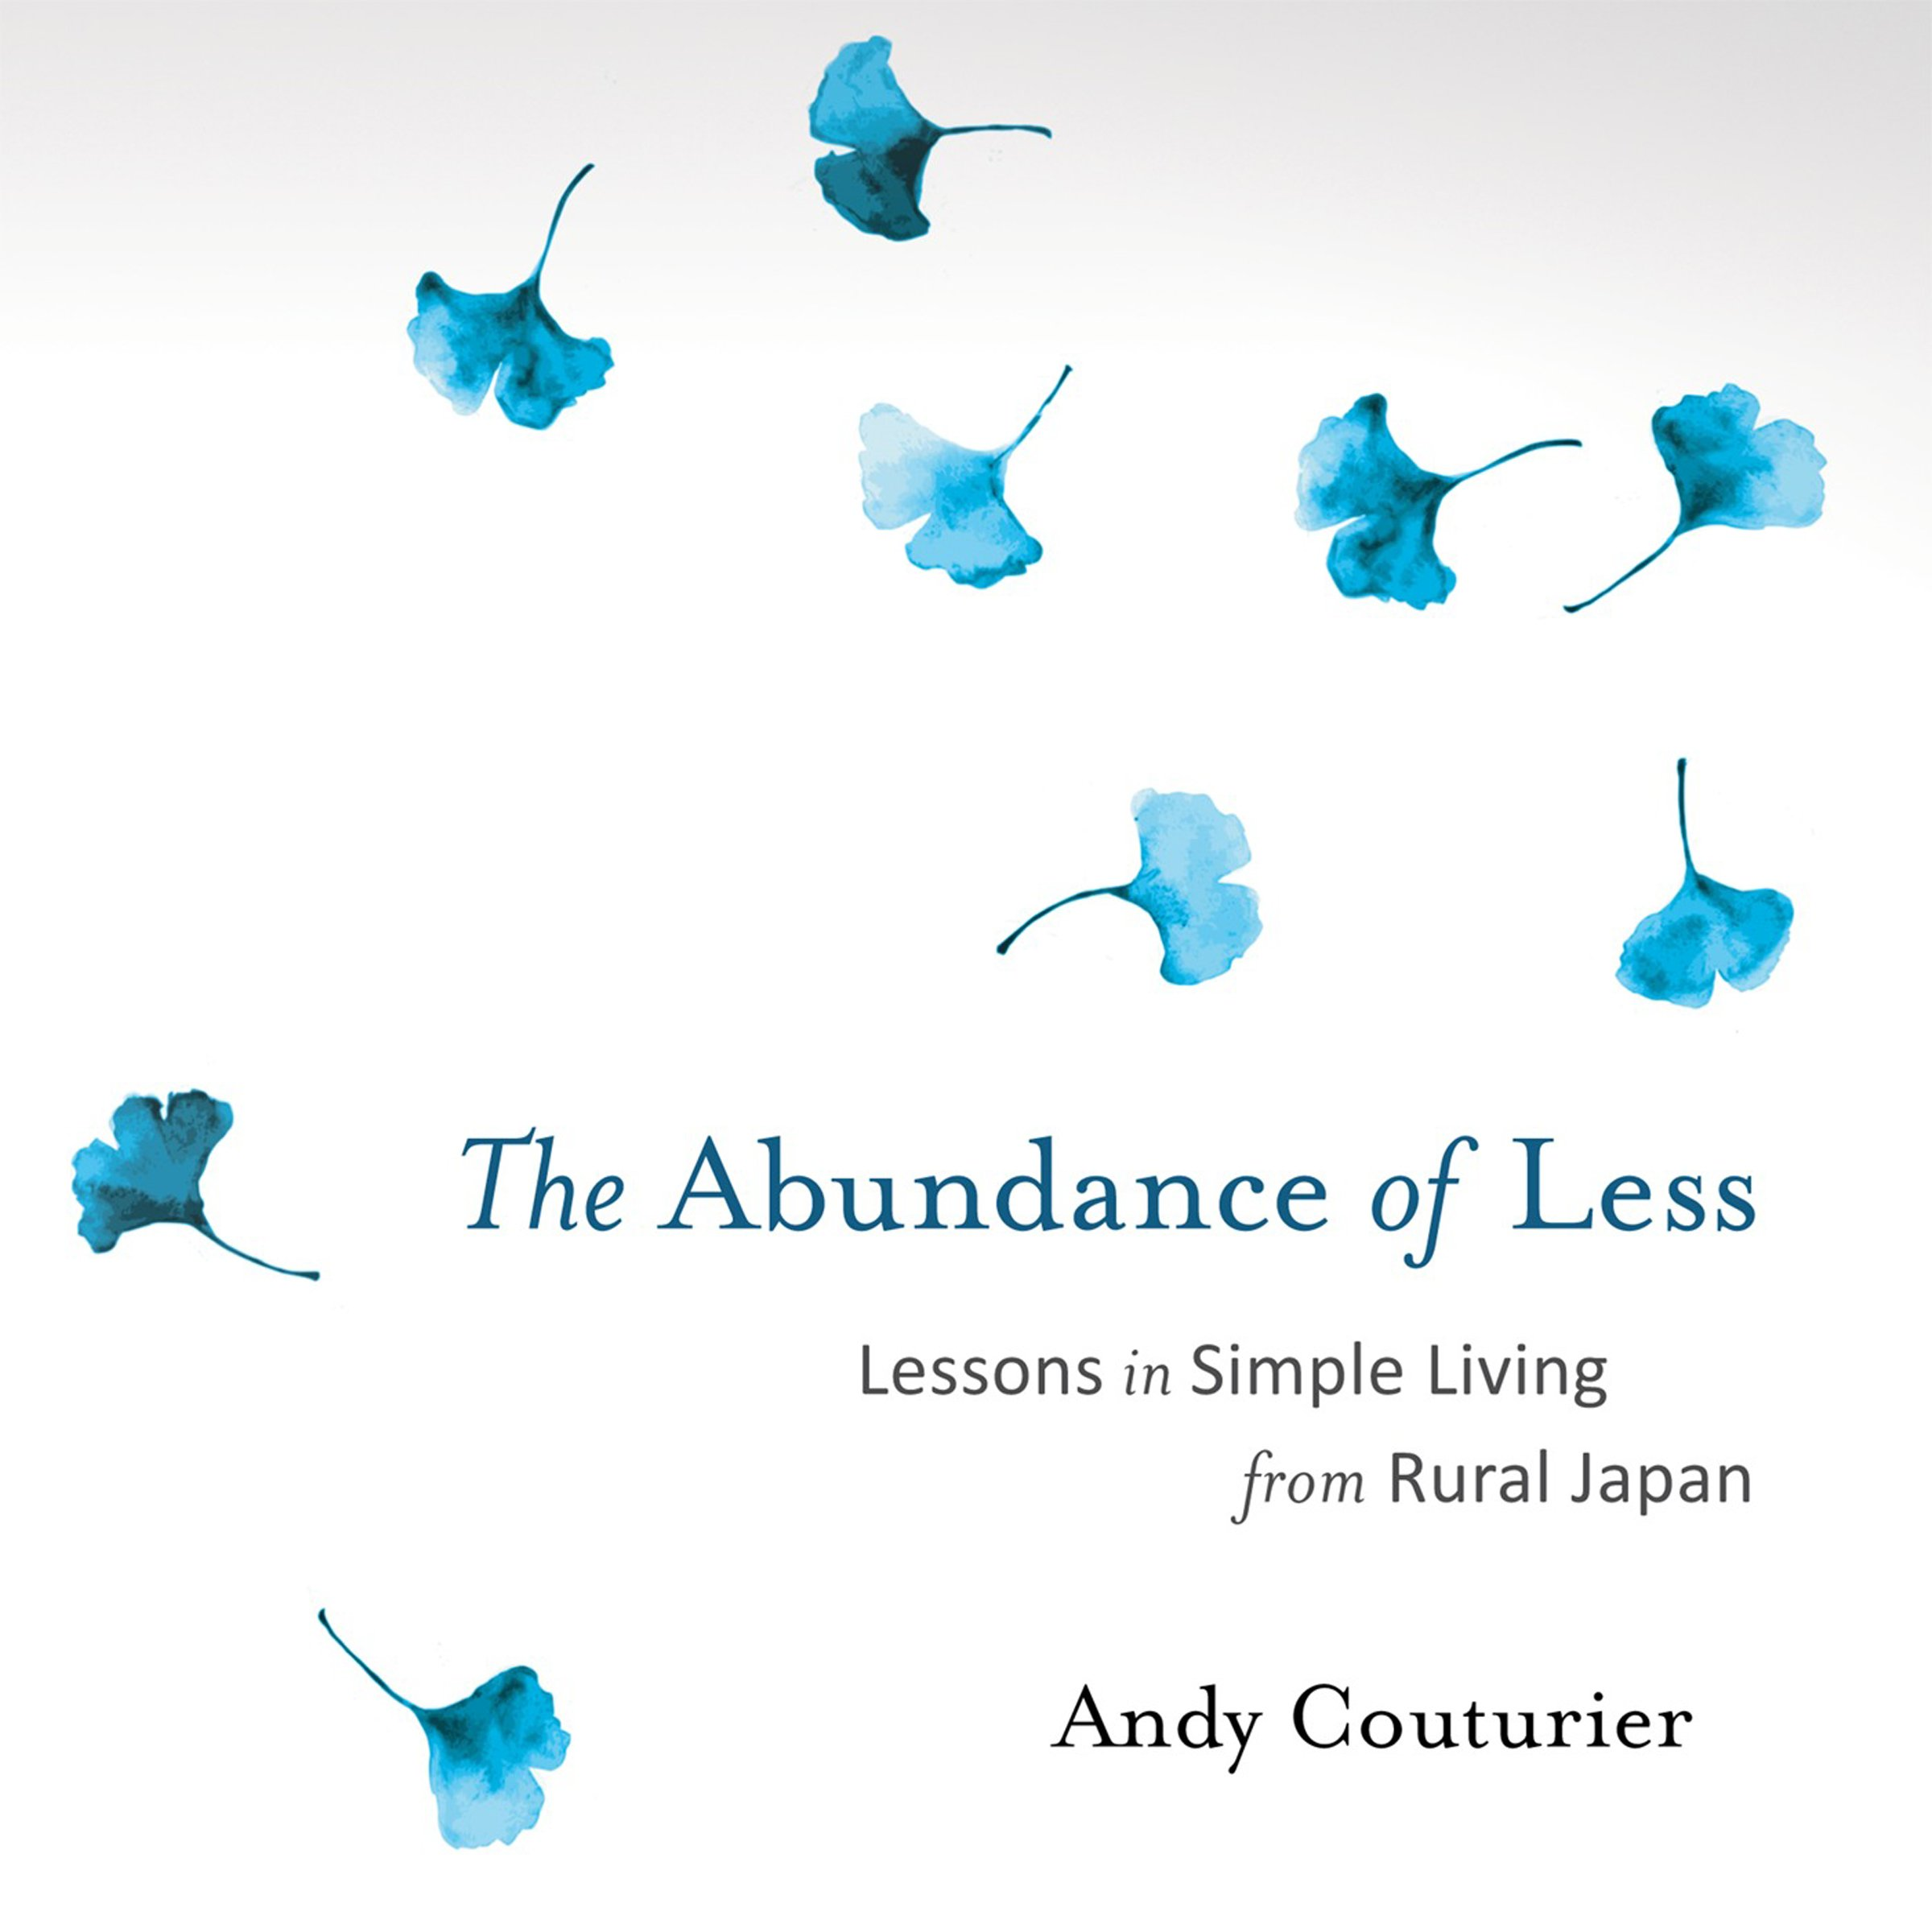 The Abundance of Less